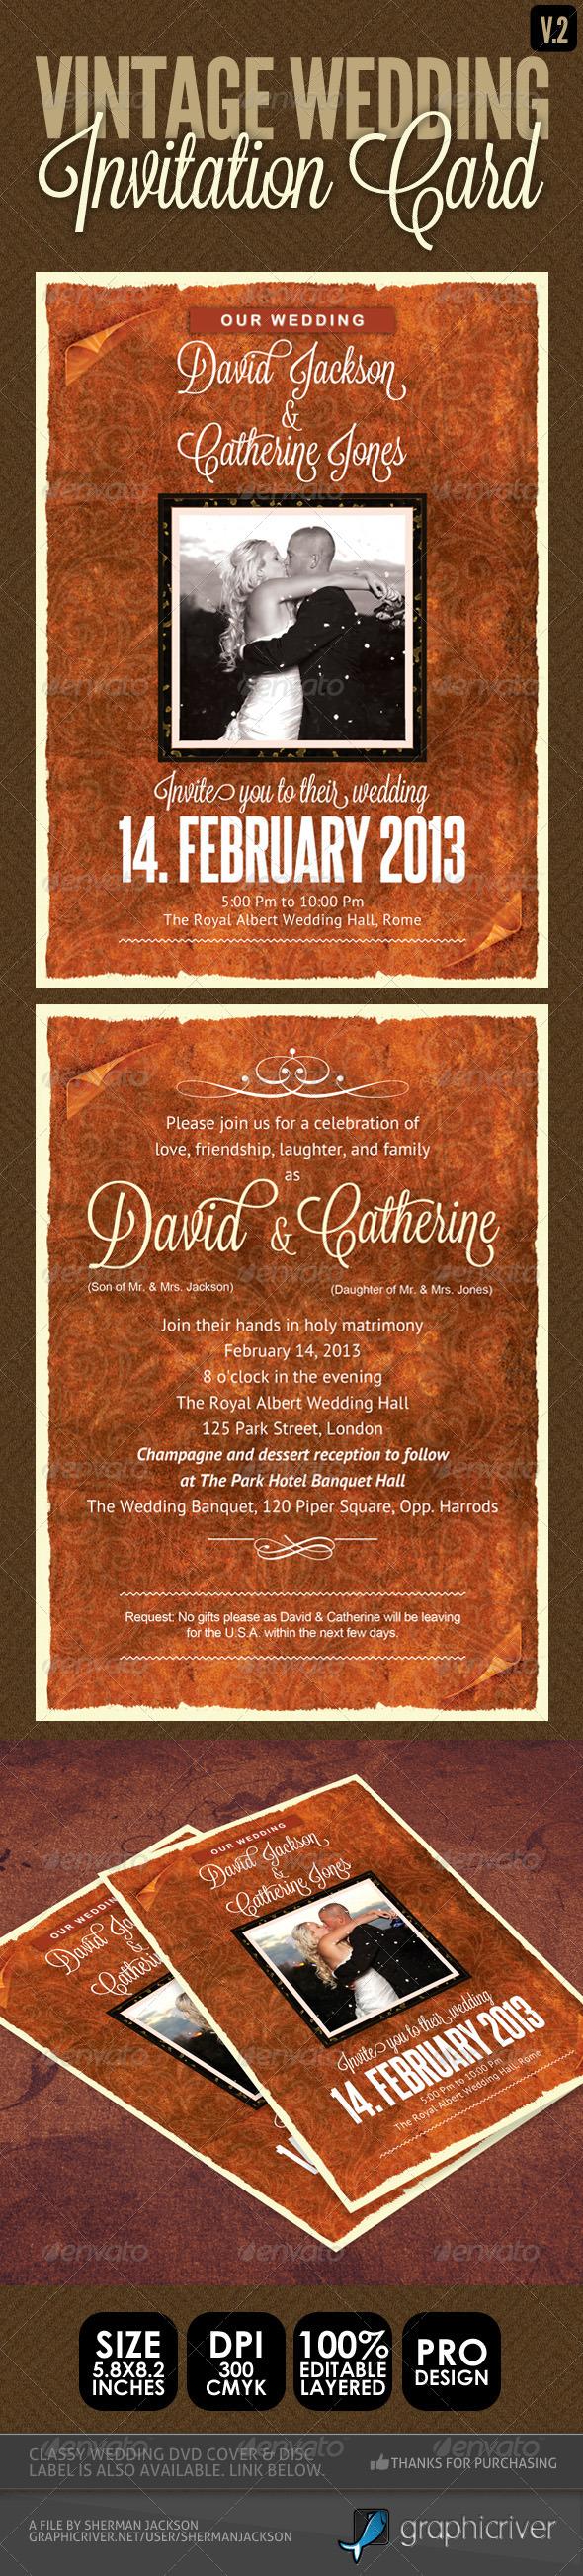 Vintage Wedding Invitation Card V.2  - Weddings Cards & Invites